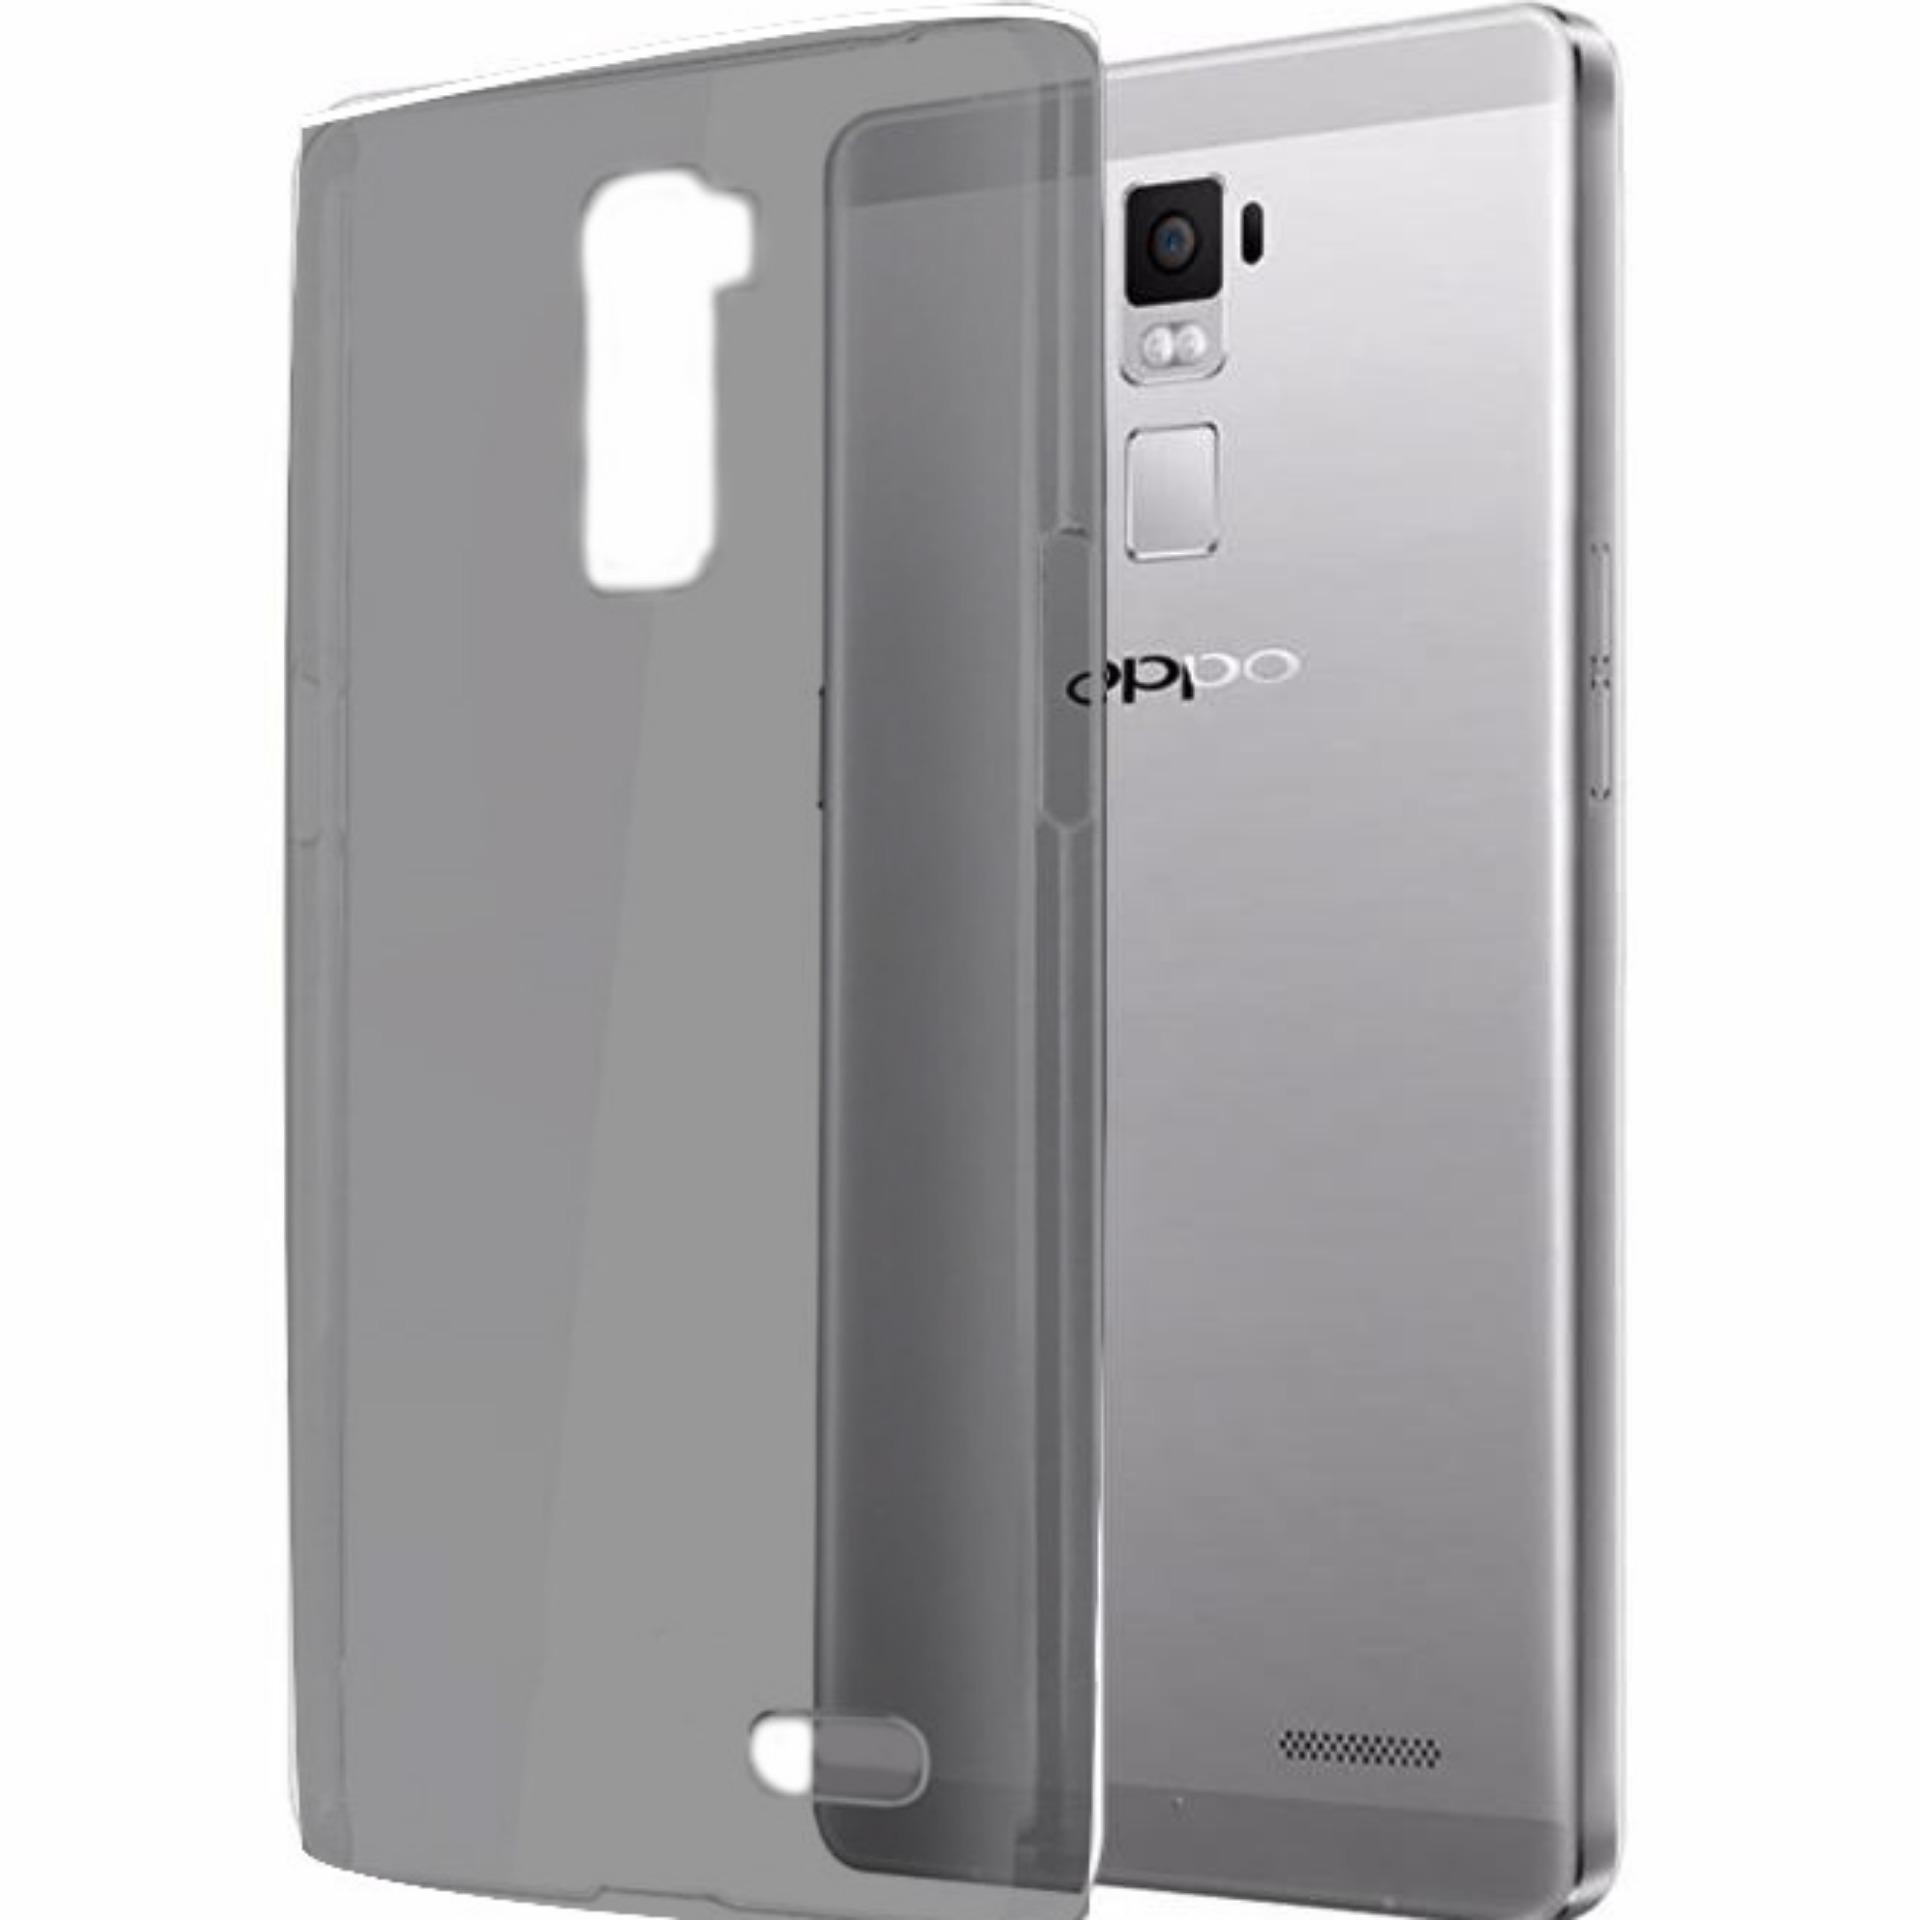 Bendoel Aircase for Oppo R7+ Plus | Softcase Ultrathin Anti Crash - Hitam Transparan